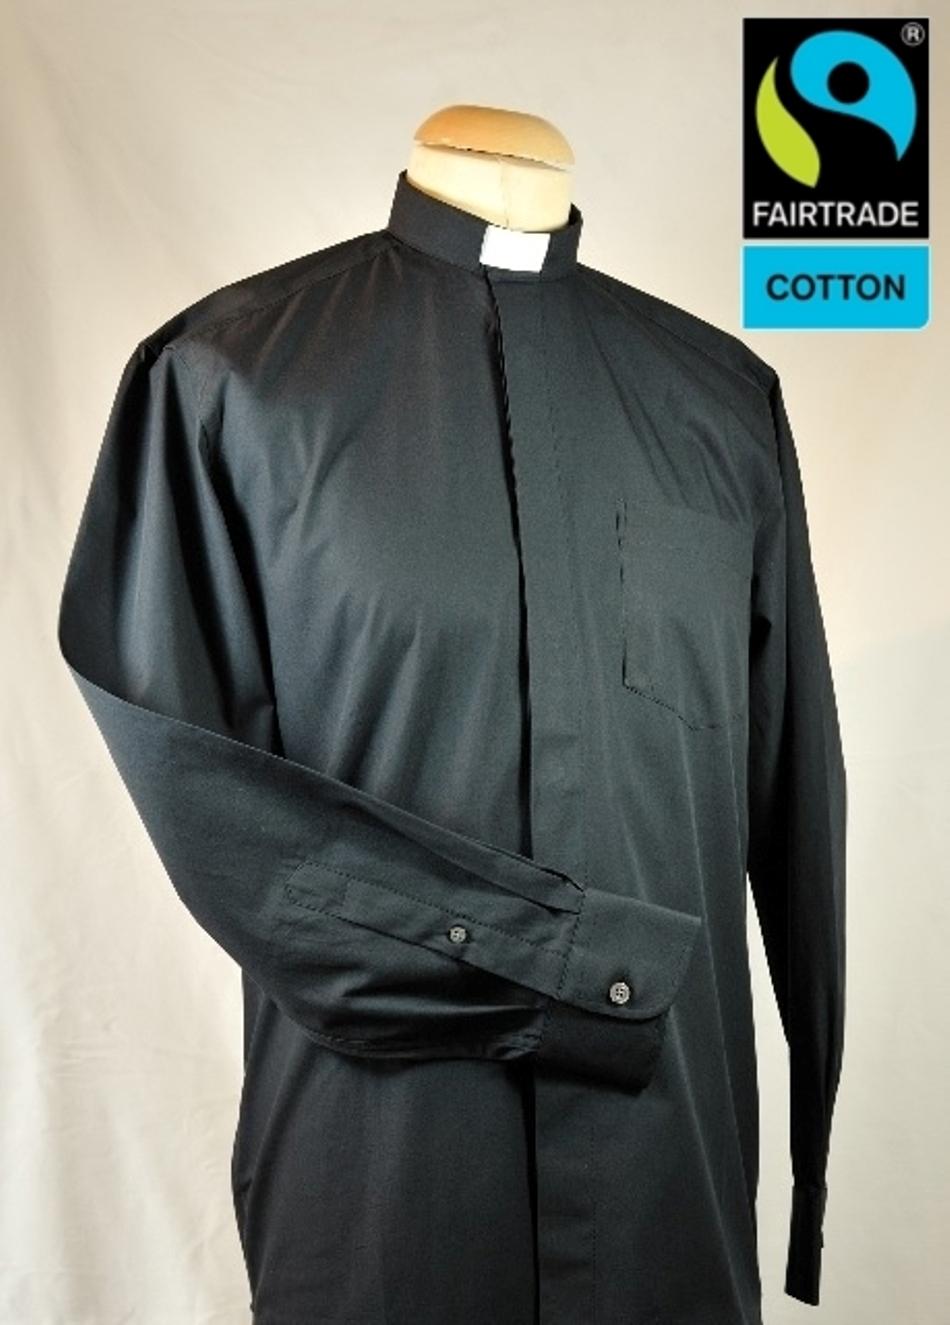 Collarhemd, schwarz , Langarm , Fairtrad Baumwolle